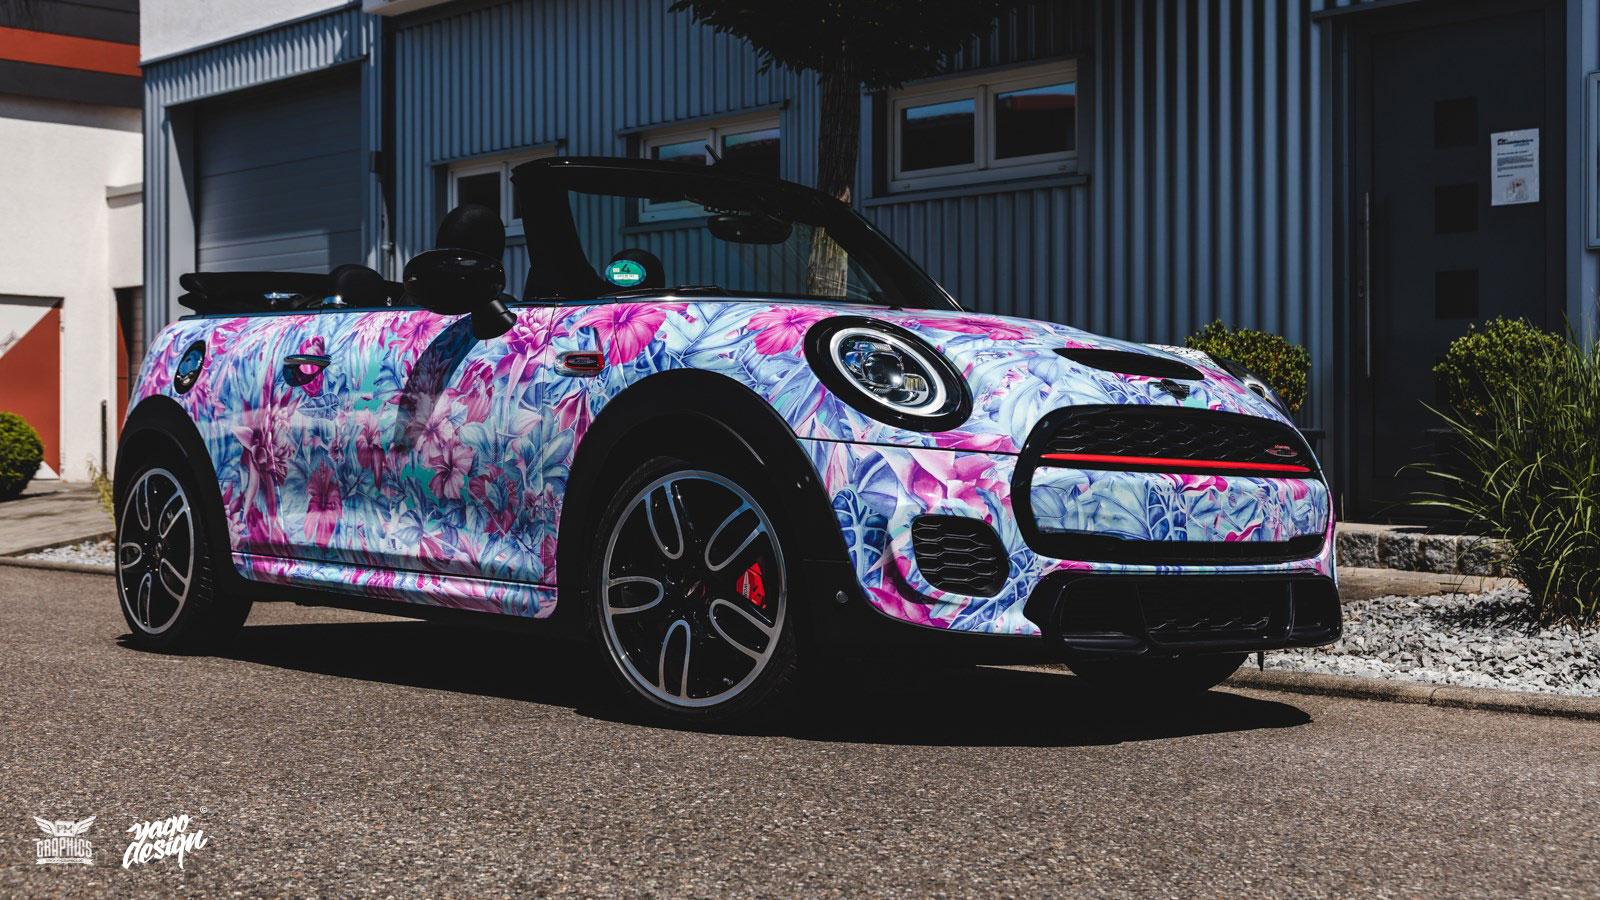 Mini-cooper-JCW-by-Yagodesign-by-Kamil-Lizak-Car-wrapping-Design-Studio-Automotive-Design-Studio-Kawai